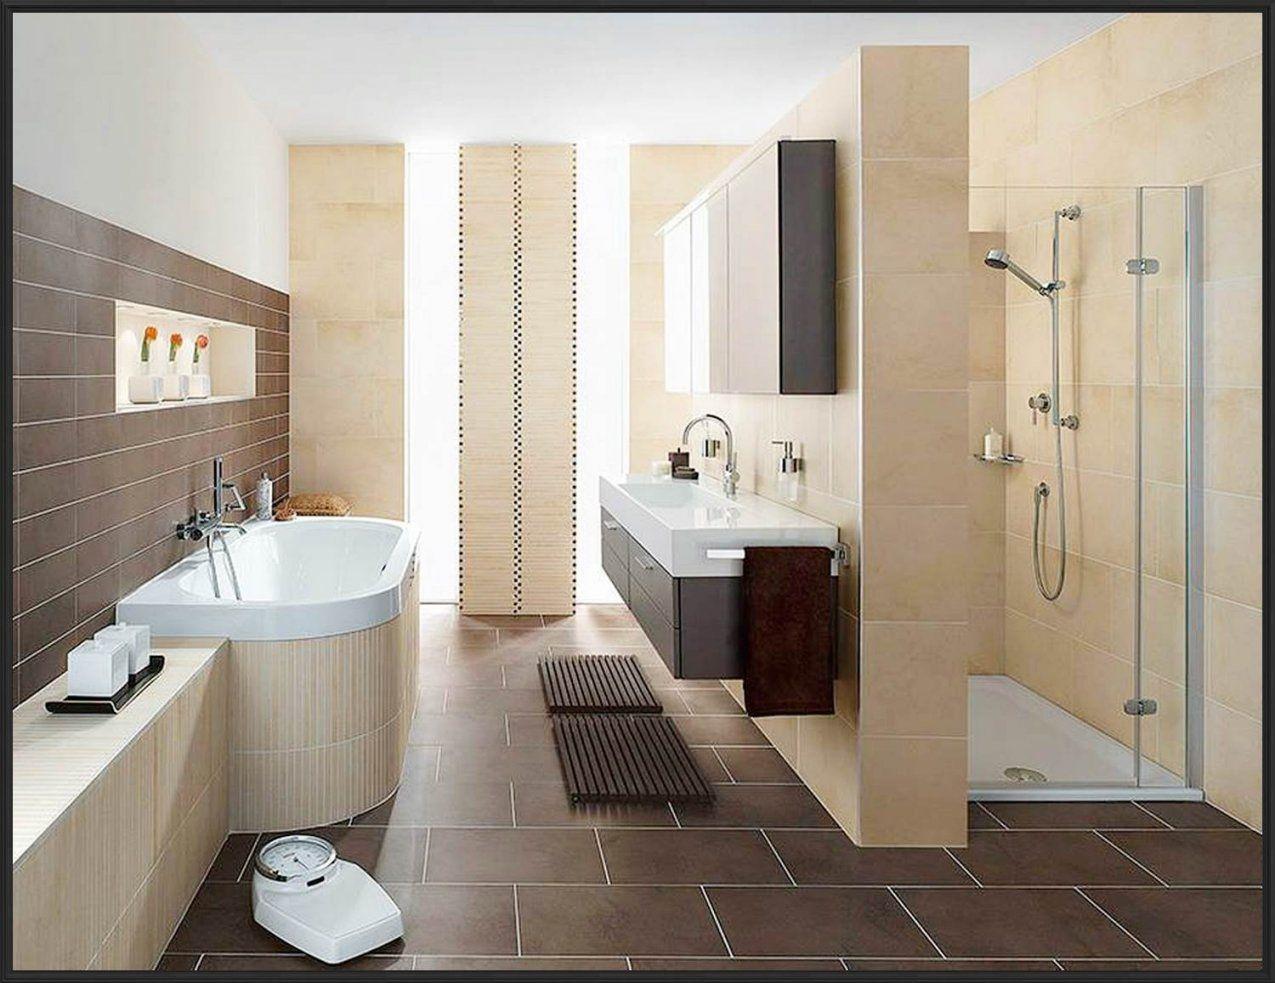 Badezimmer 10 Quadratmeter  Design von Grundriss Badezimmer 10 Qm Photo